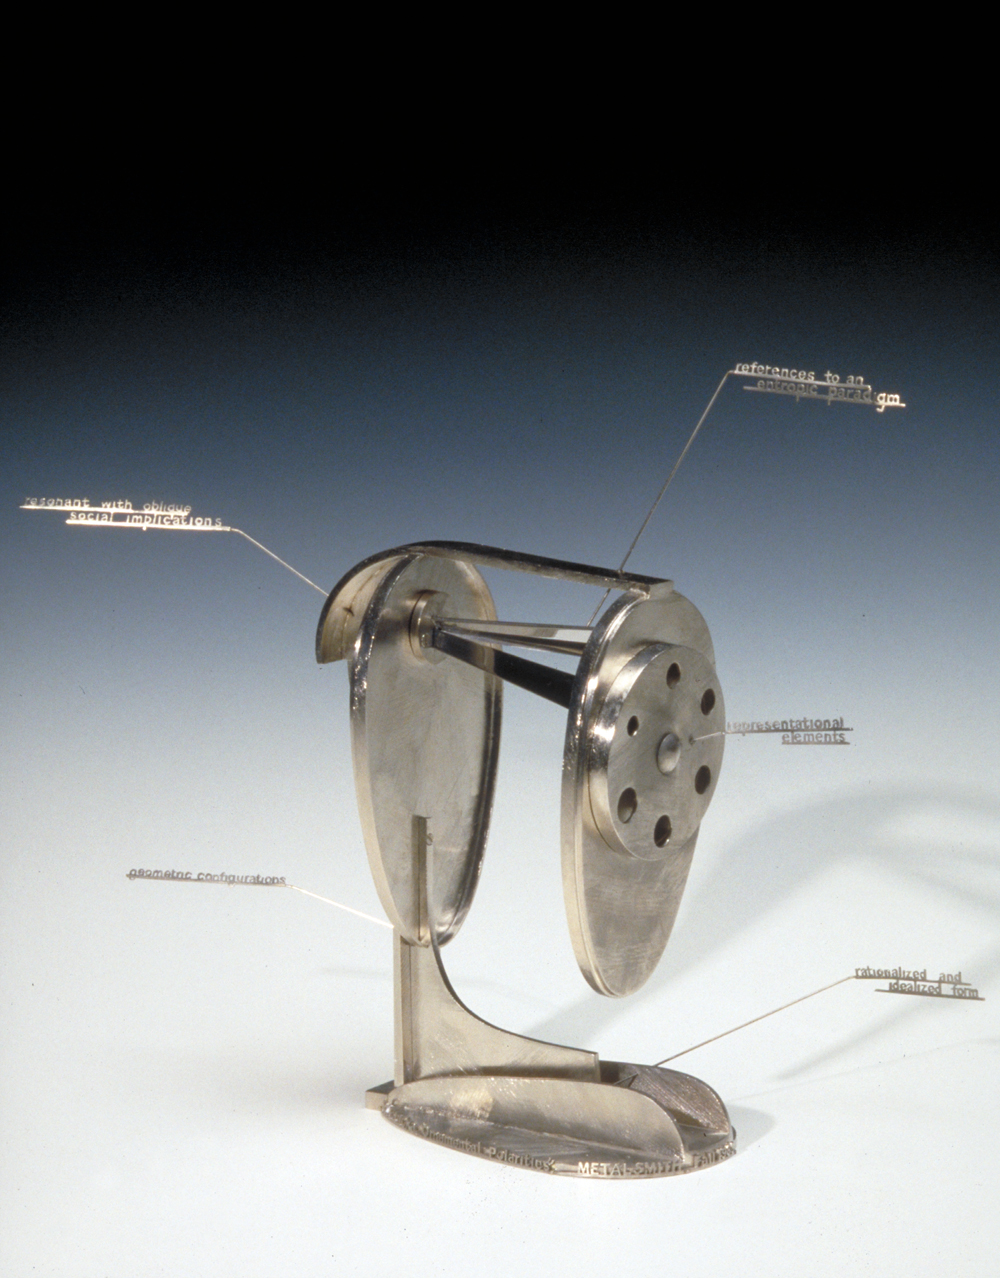 Didactic pencil sharpener sculpture about art criticism